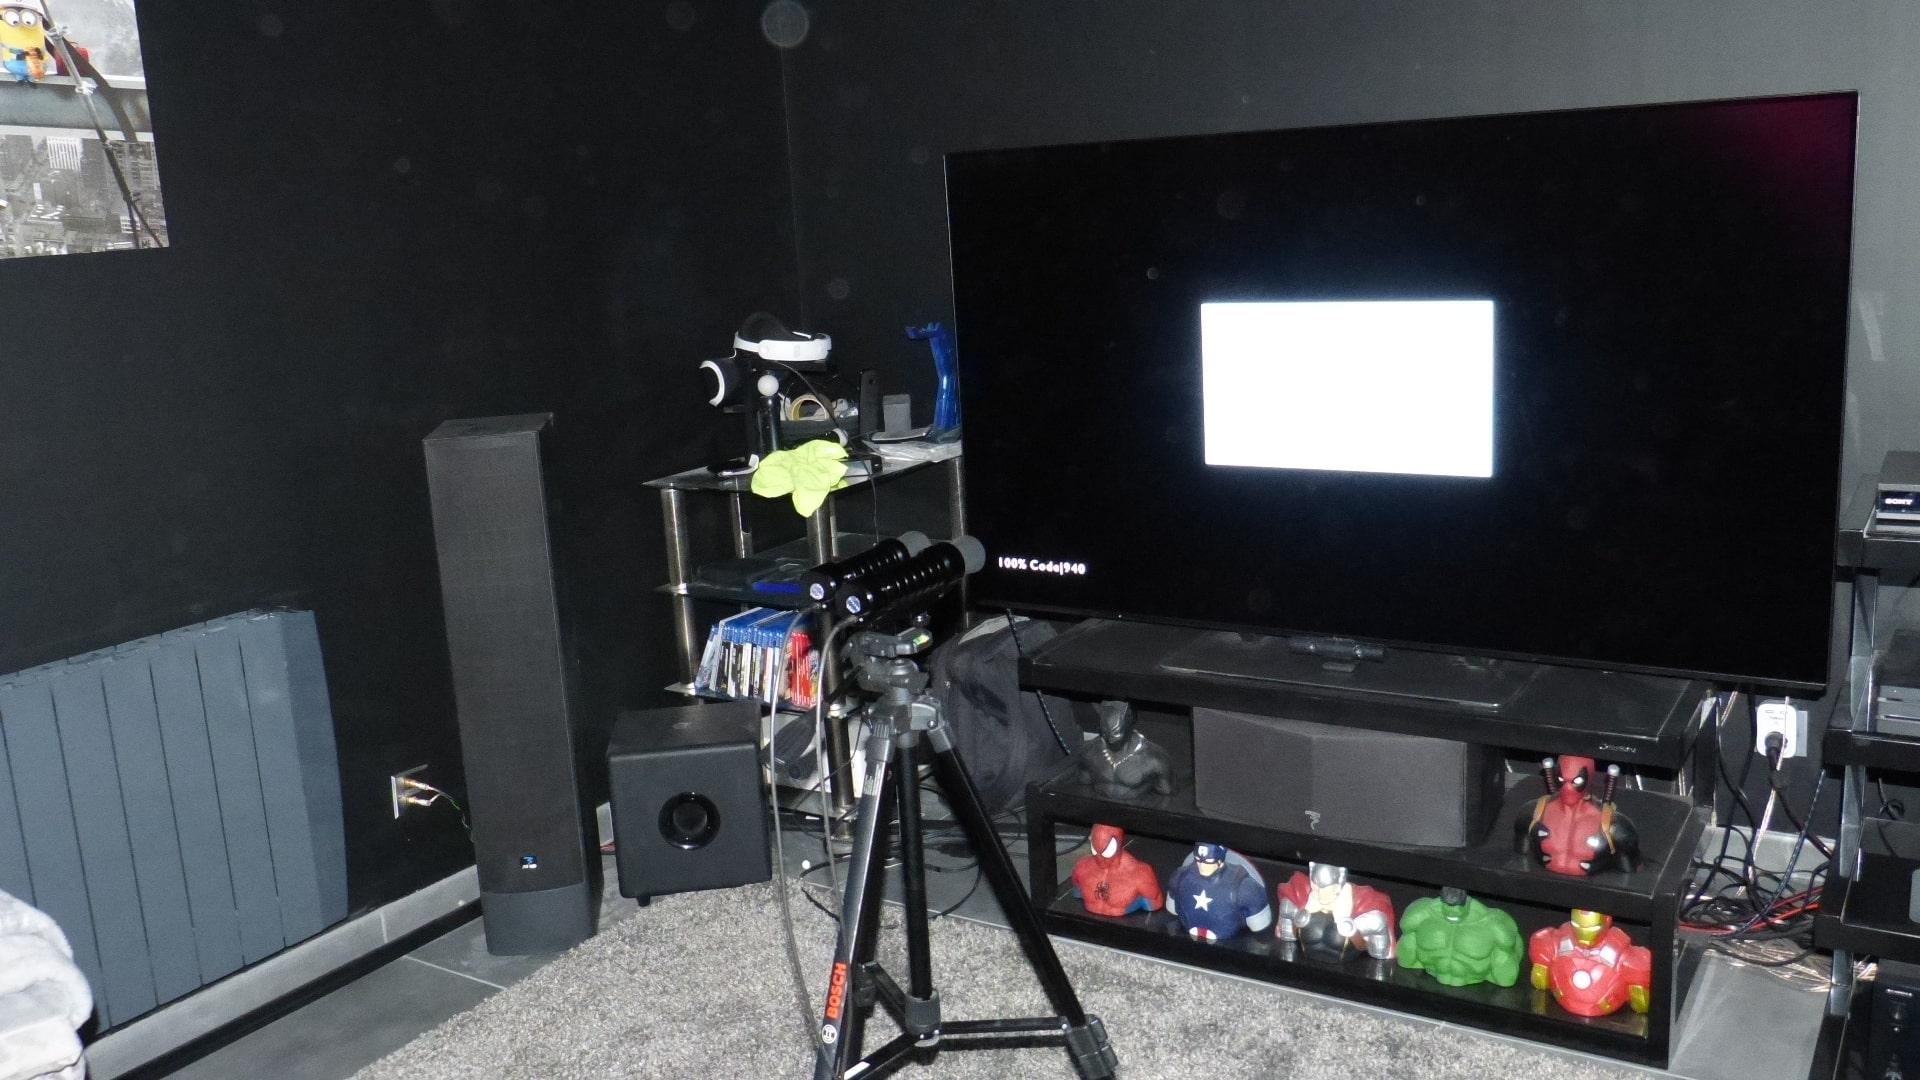 Calibrage d'un écran OLED Panasonic 65EZ950